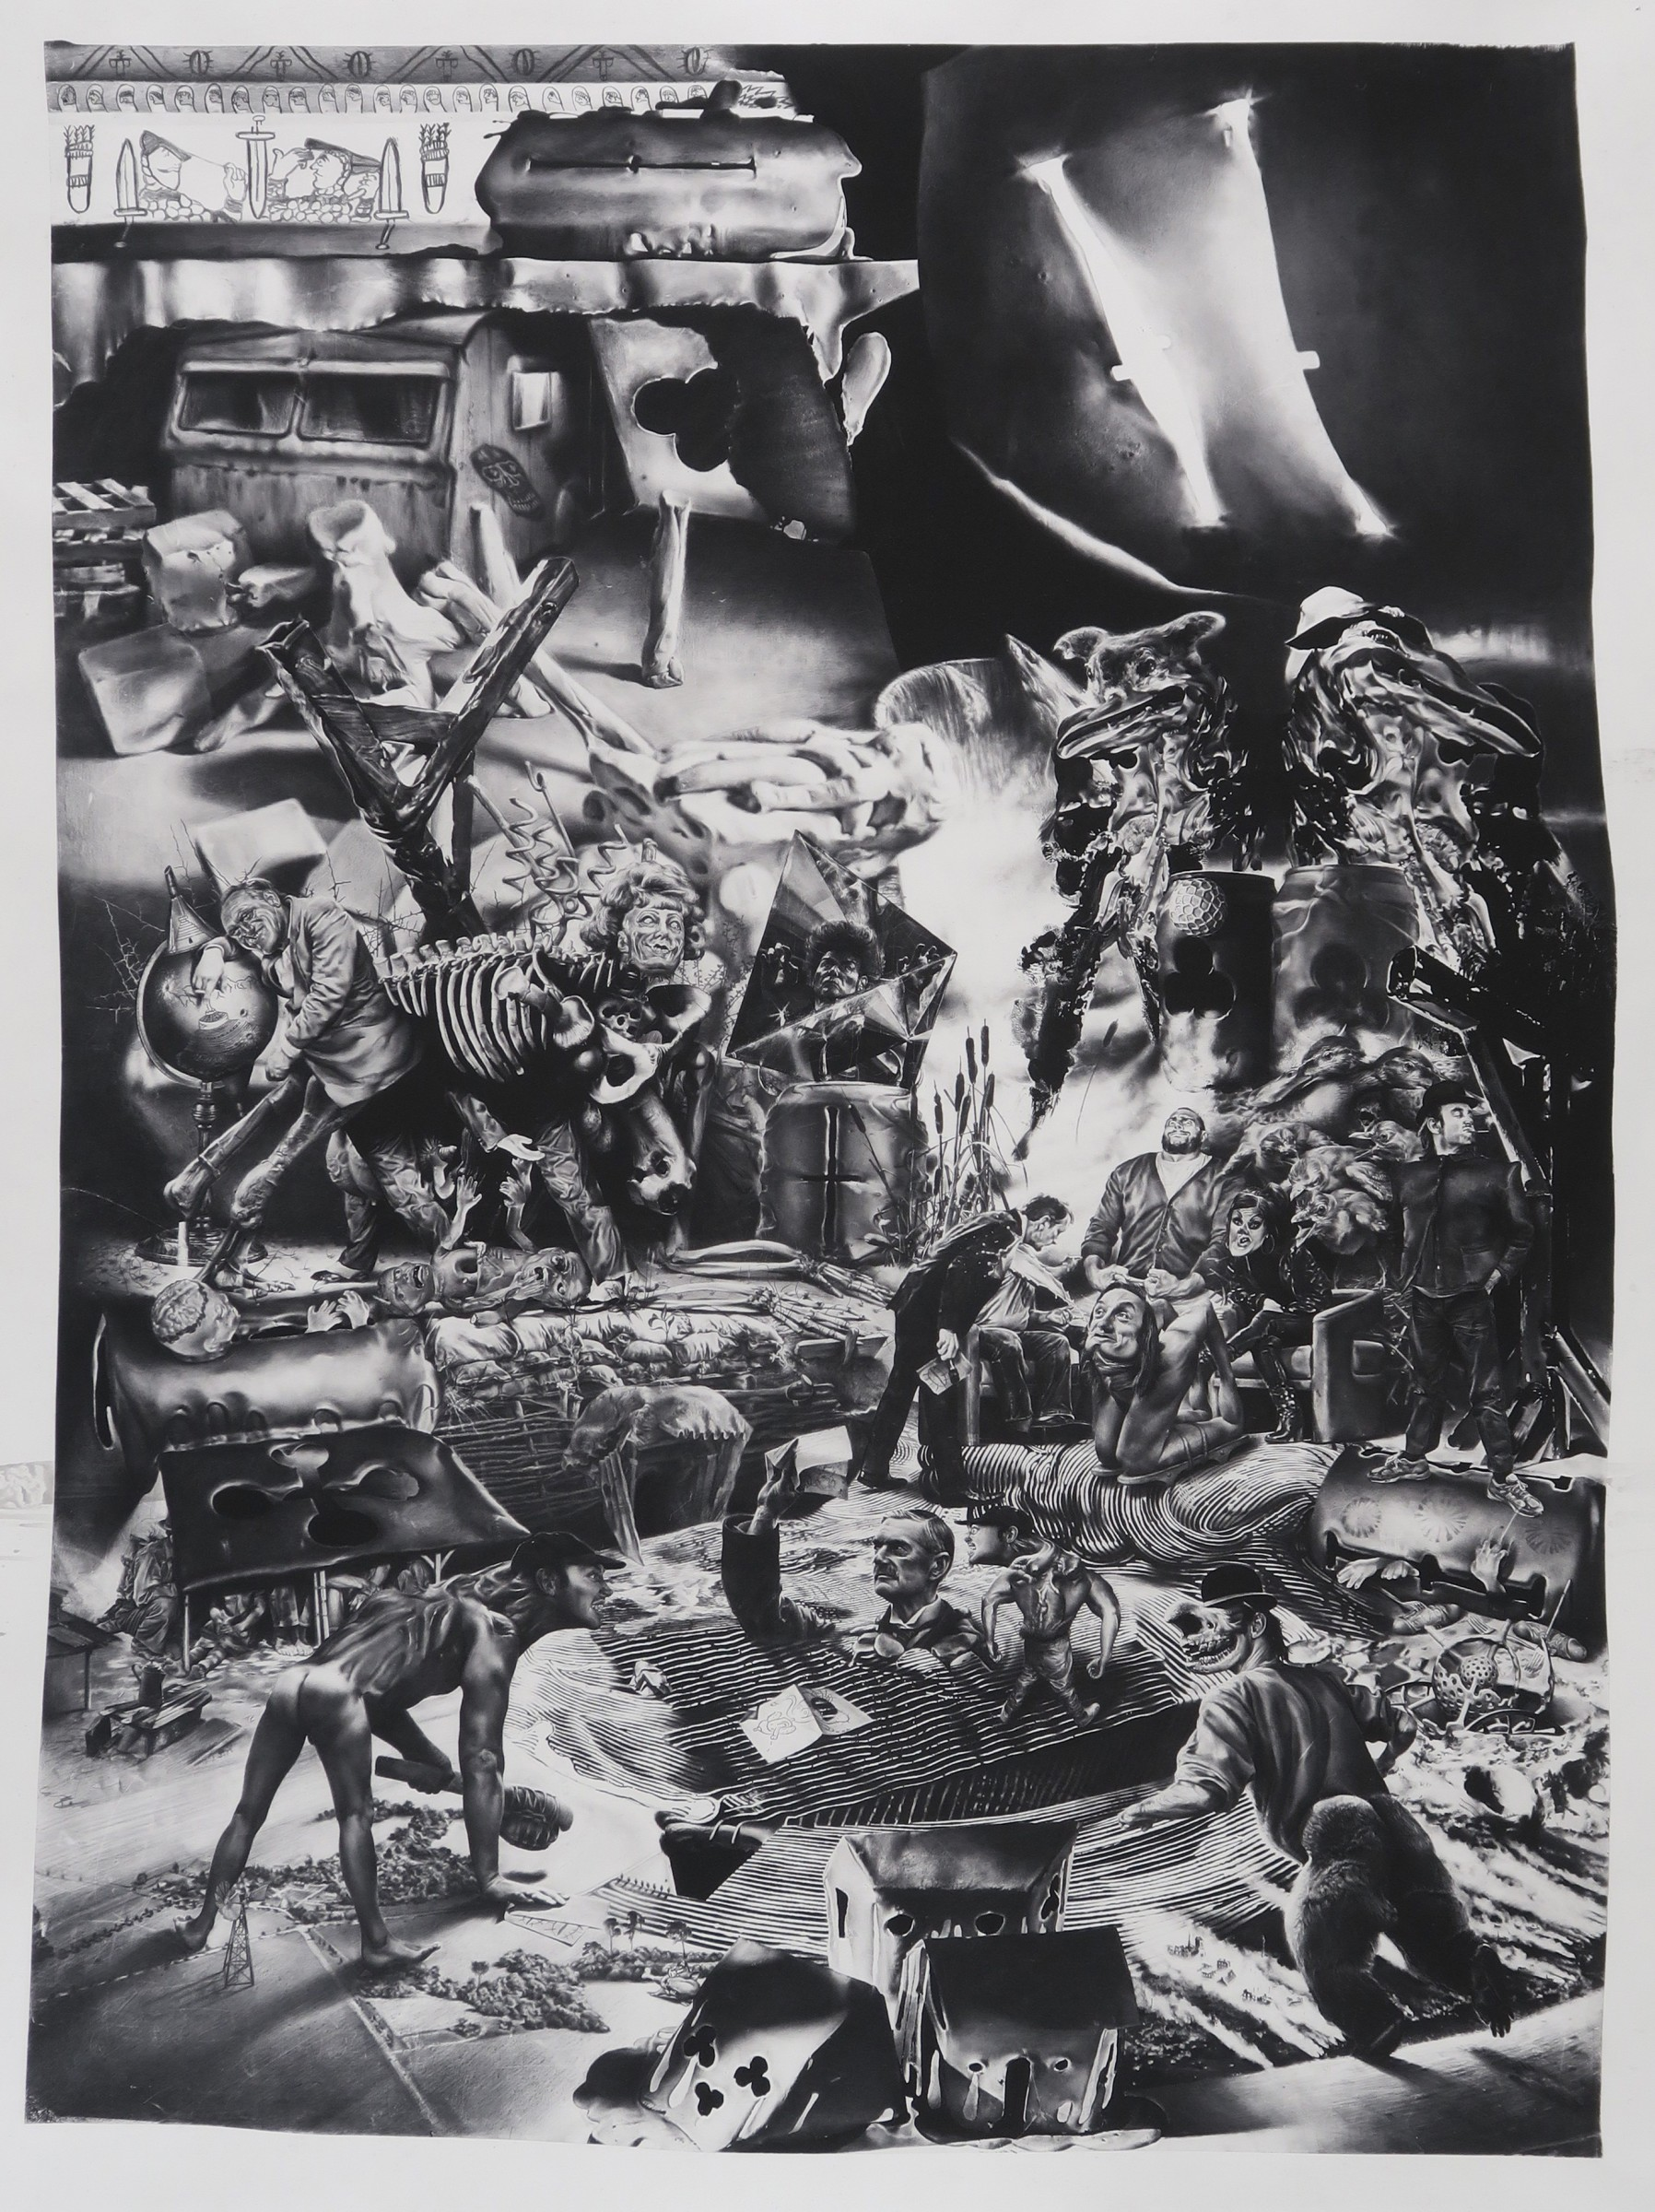 <span class=&#34;link fancybox-details-link&#34;><a href=&#34;/exhibitions/98/works/image2066/&#34;>View Detail Page</a></span><div id=&#34;artwork-panel-details&#34; class=&#34;standard-artwork-details&#34;><div class=&#34;artist&#34;><strong>Robert McNally</strong></div><div class=&#34;title&#34;><em>2016 &#196;nnus Horribilis</em>, 2017</div><div class=&#34;medium&#34;>Photogravure on Hahnem&#252;hle paper</div><div class=&#34;dimensions&#34;>92.5 x 71.3 cm<br /> 36 3/8 x 28 1/8 in<br /> Framed</div><div class=&#34;edition_details&#34;>Edition of 12, #1/12</div></div>